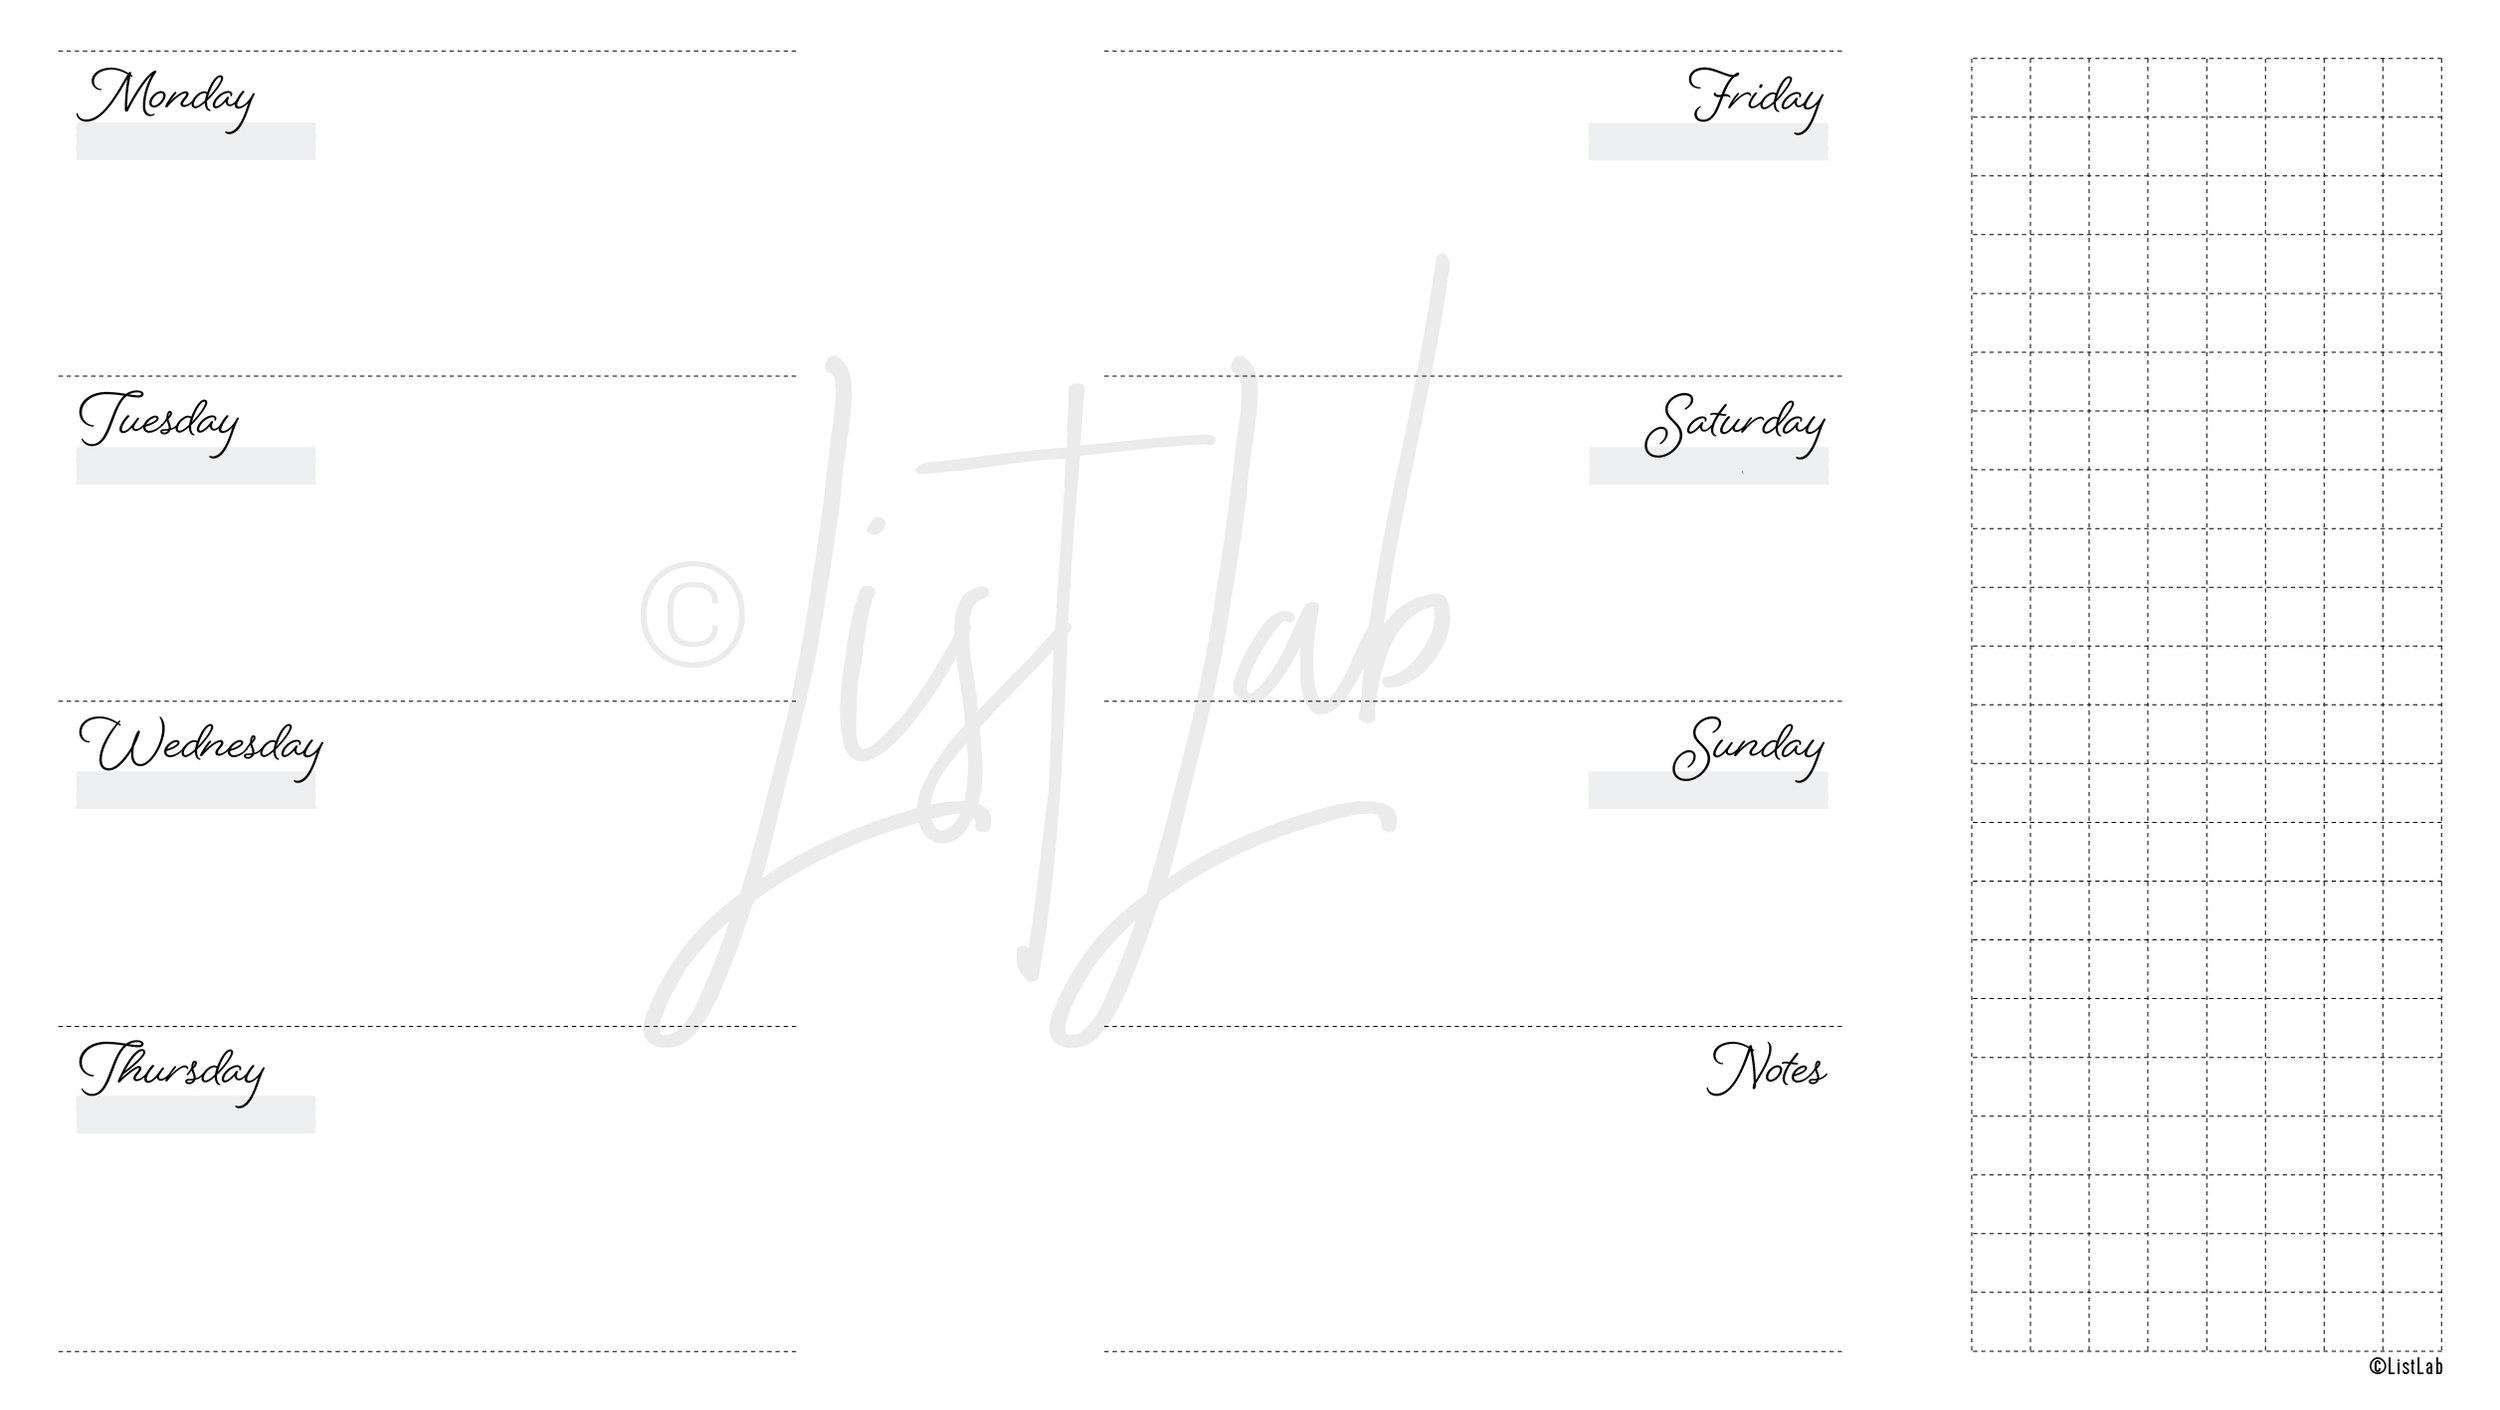 script_ring_pocket_fold out-01.jpg